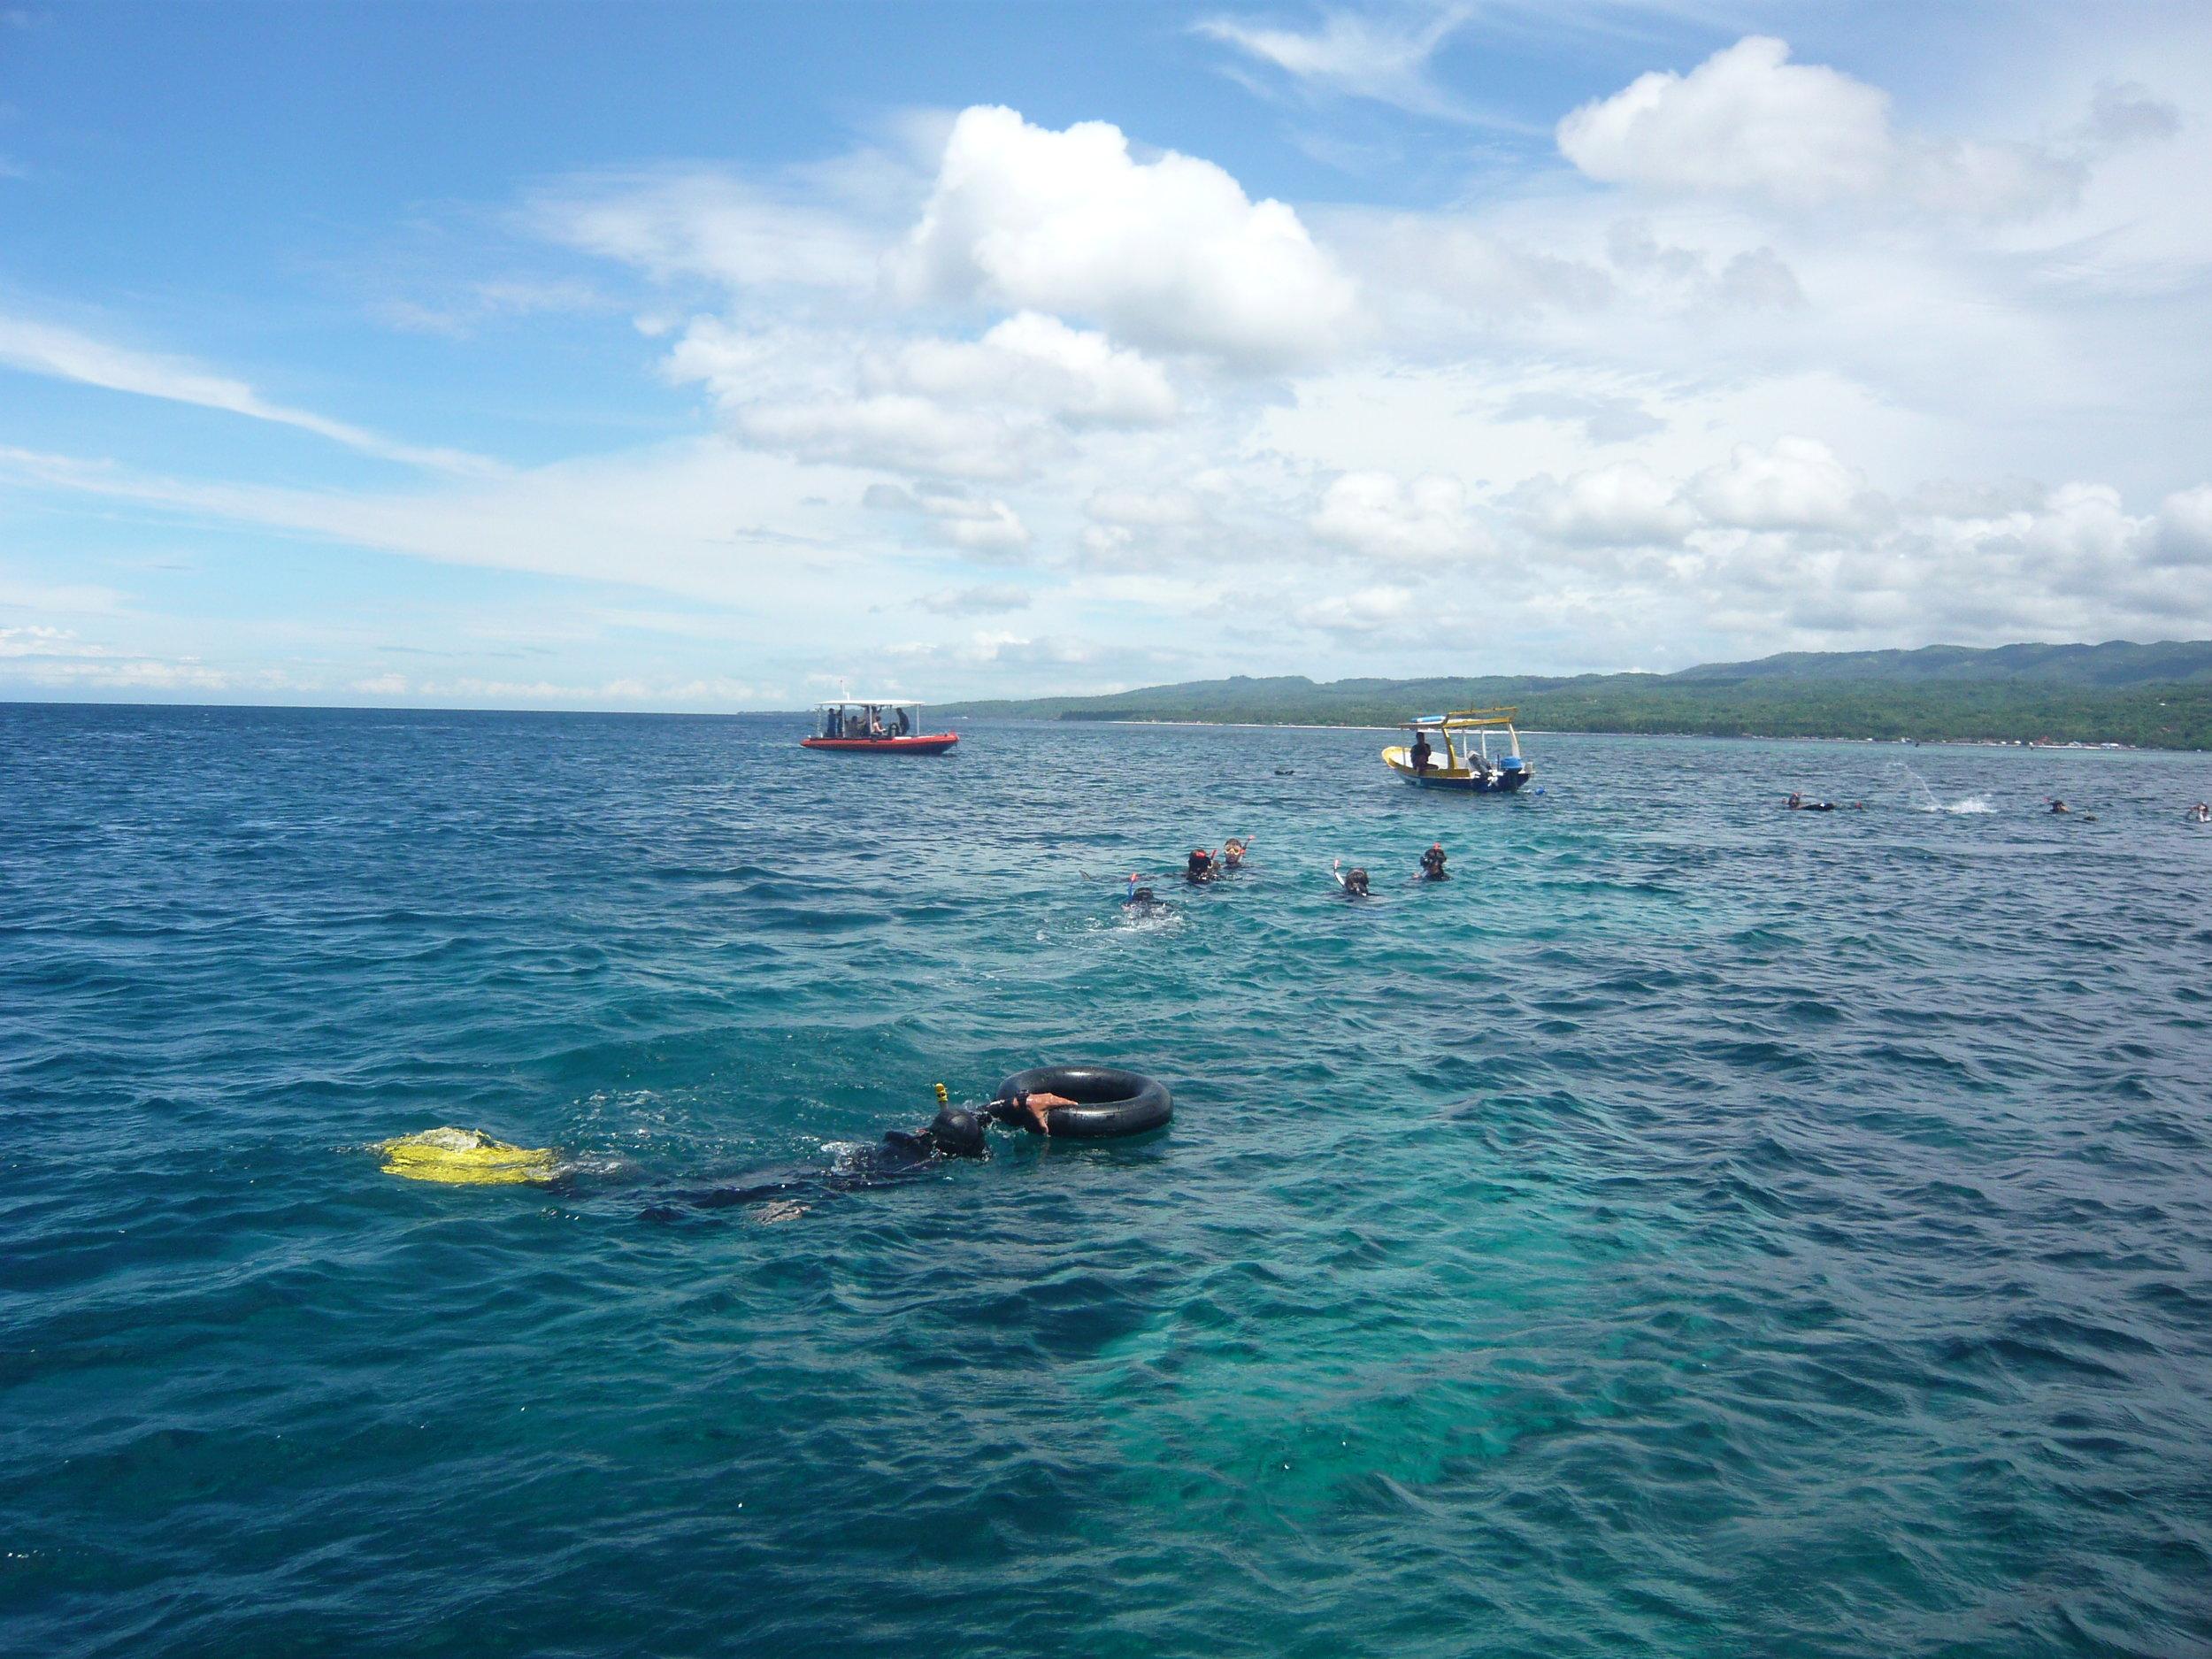 Bali, Snorkeling, Student, Life Ring.JPG